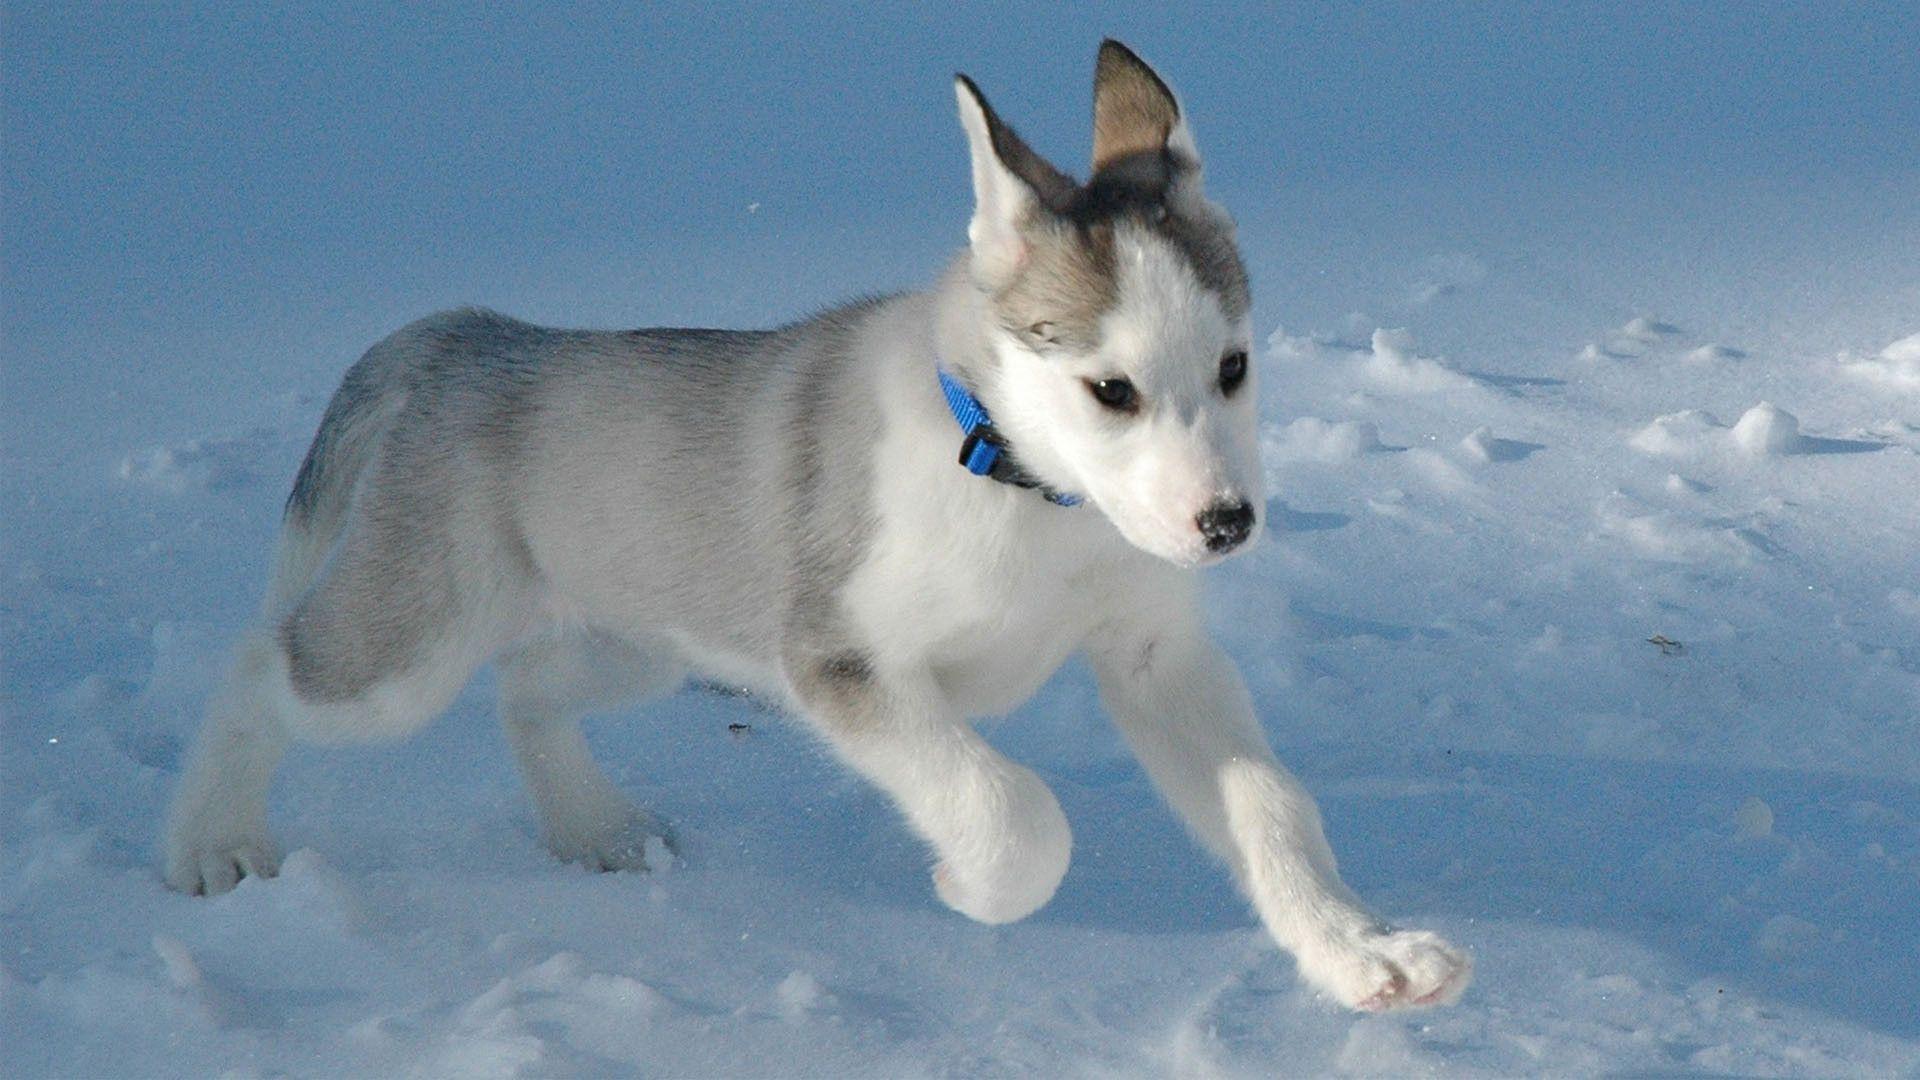 Running In The Snow Husky Puppy Siberian Husky Dog Siberian